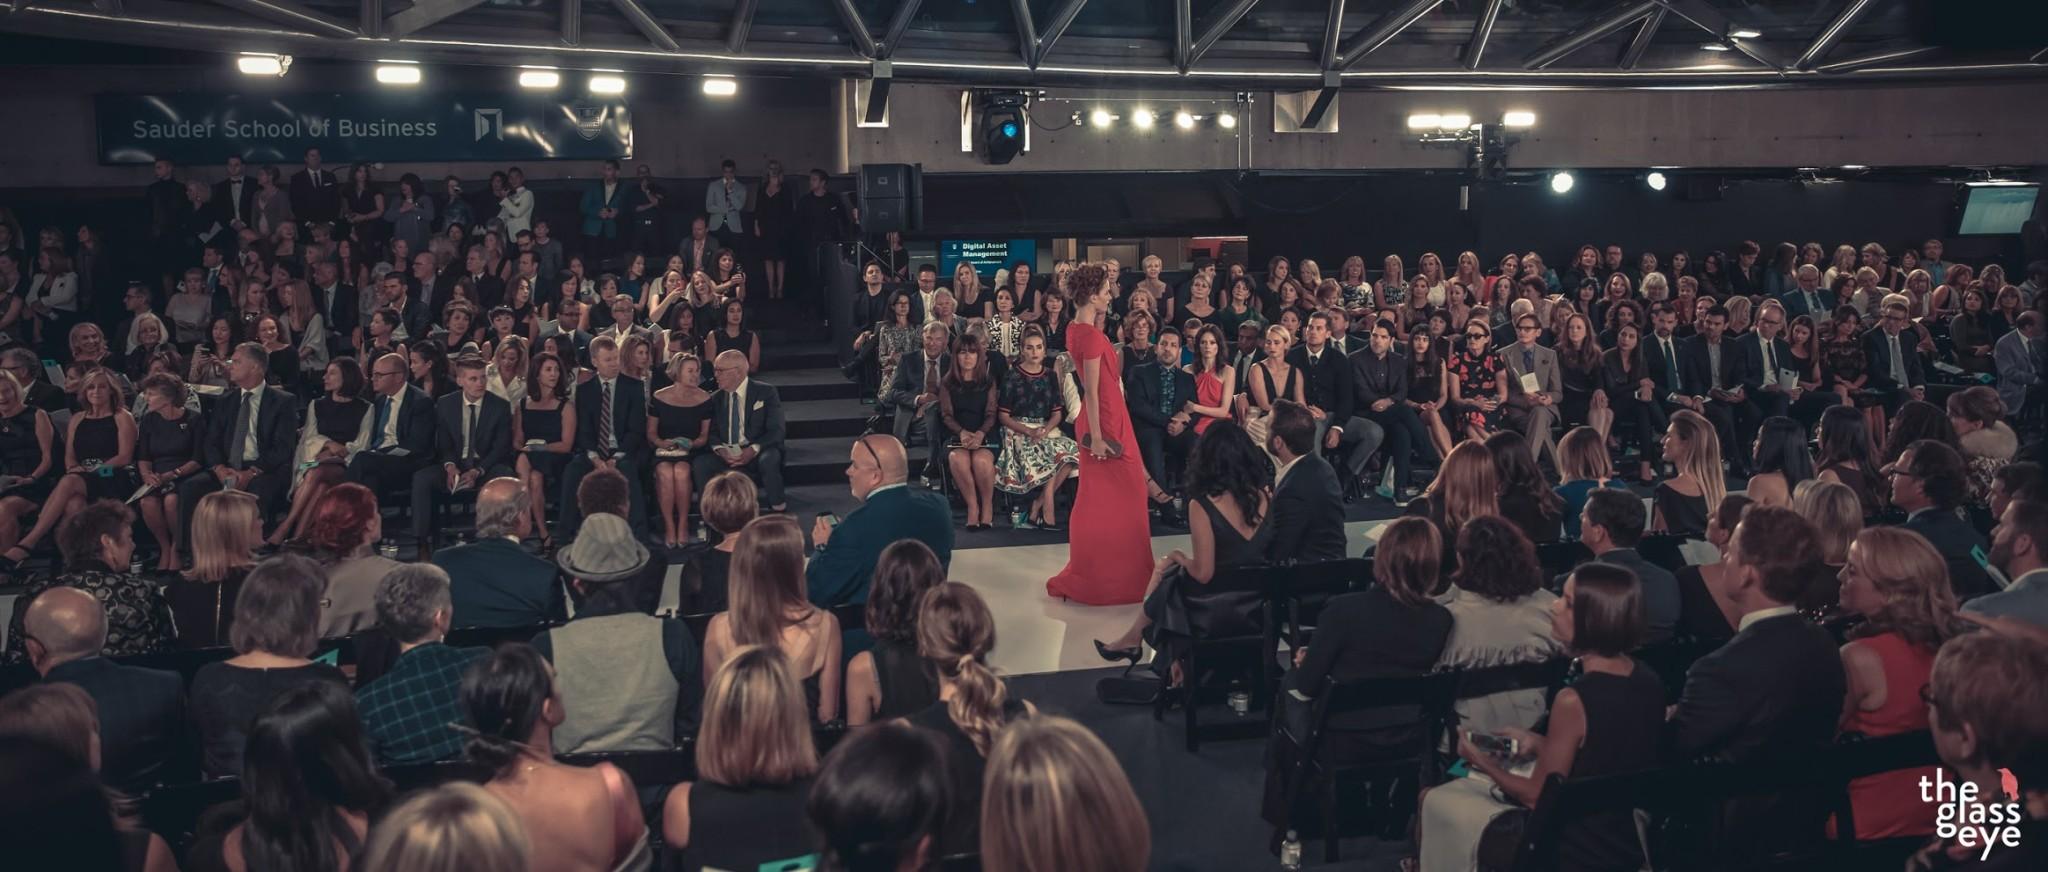 TGE_Nordstrom_FashionShow_VCB-016